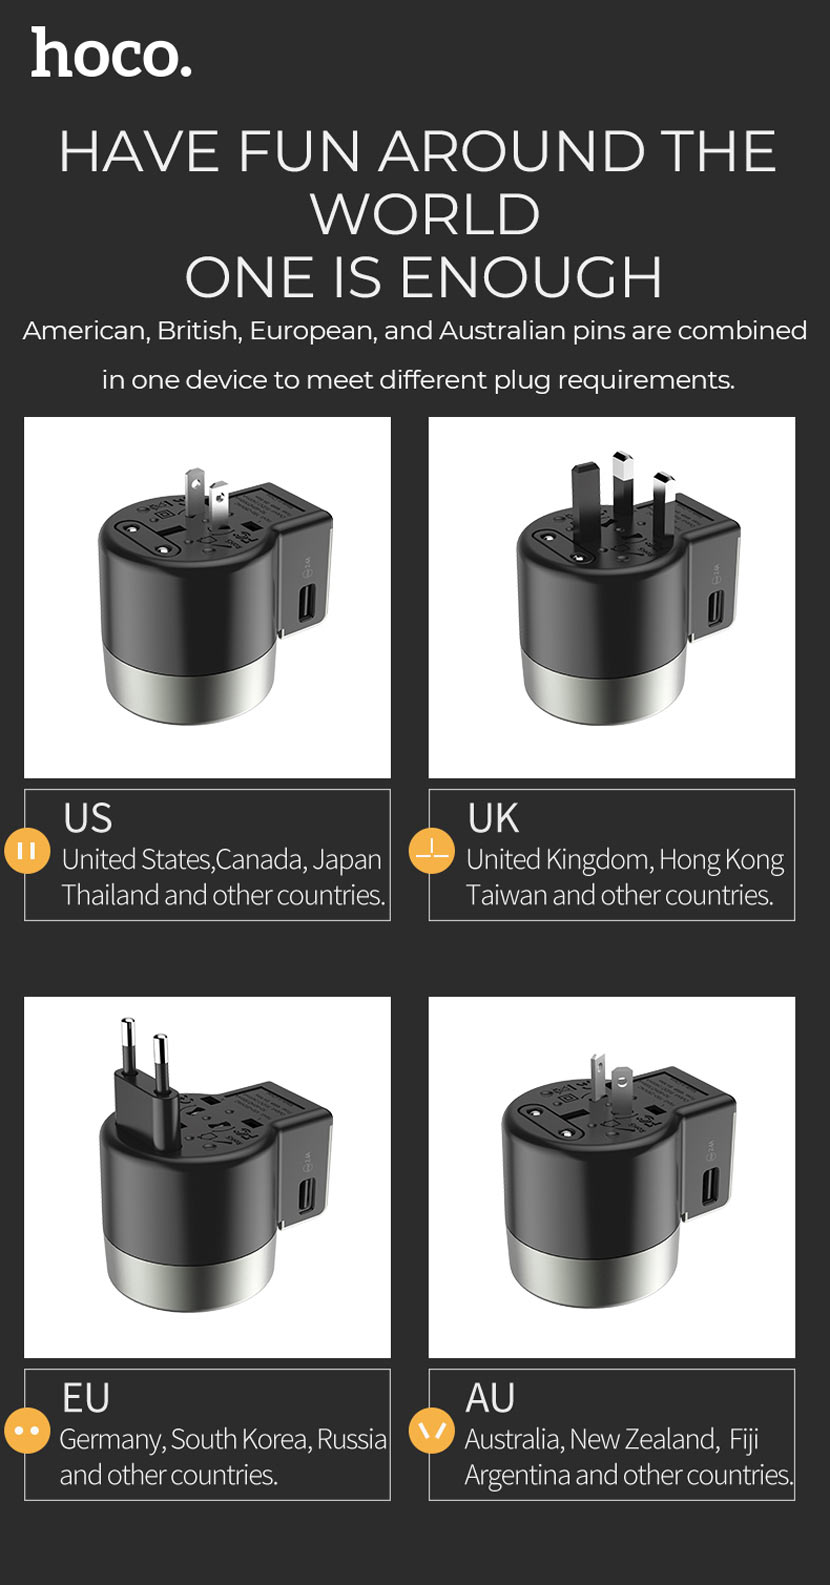 hoco news ac4 dual port rotating charging universal converter plug en